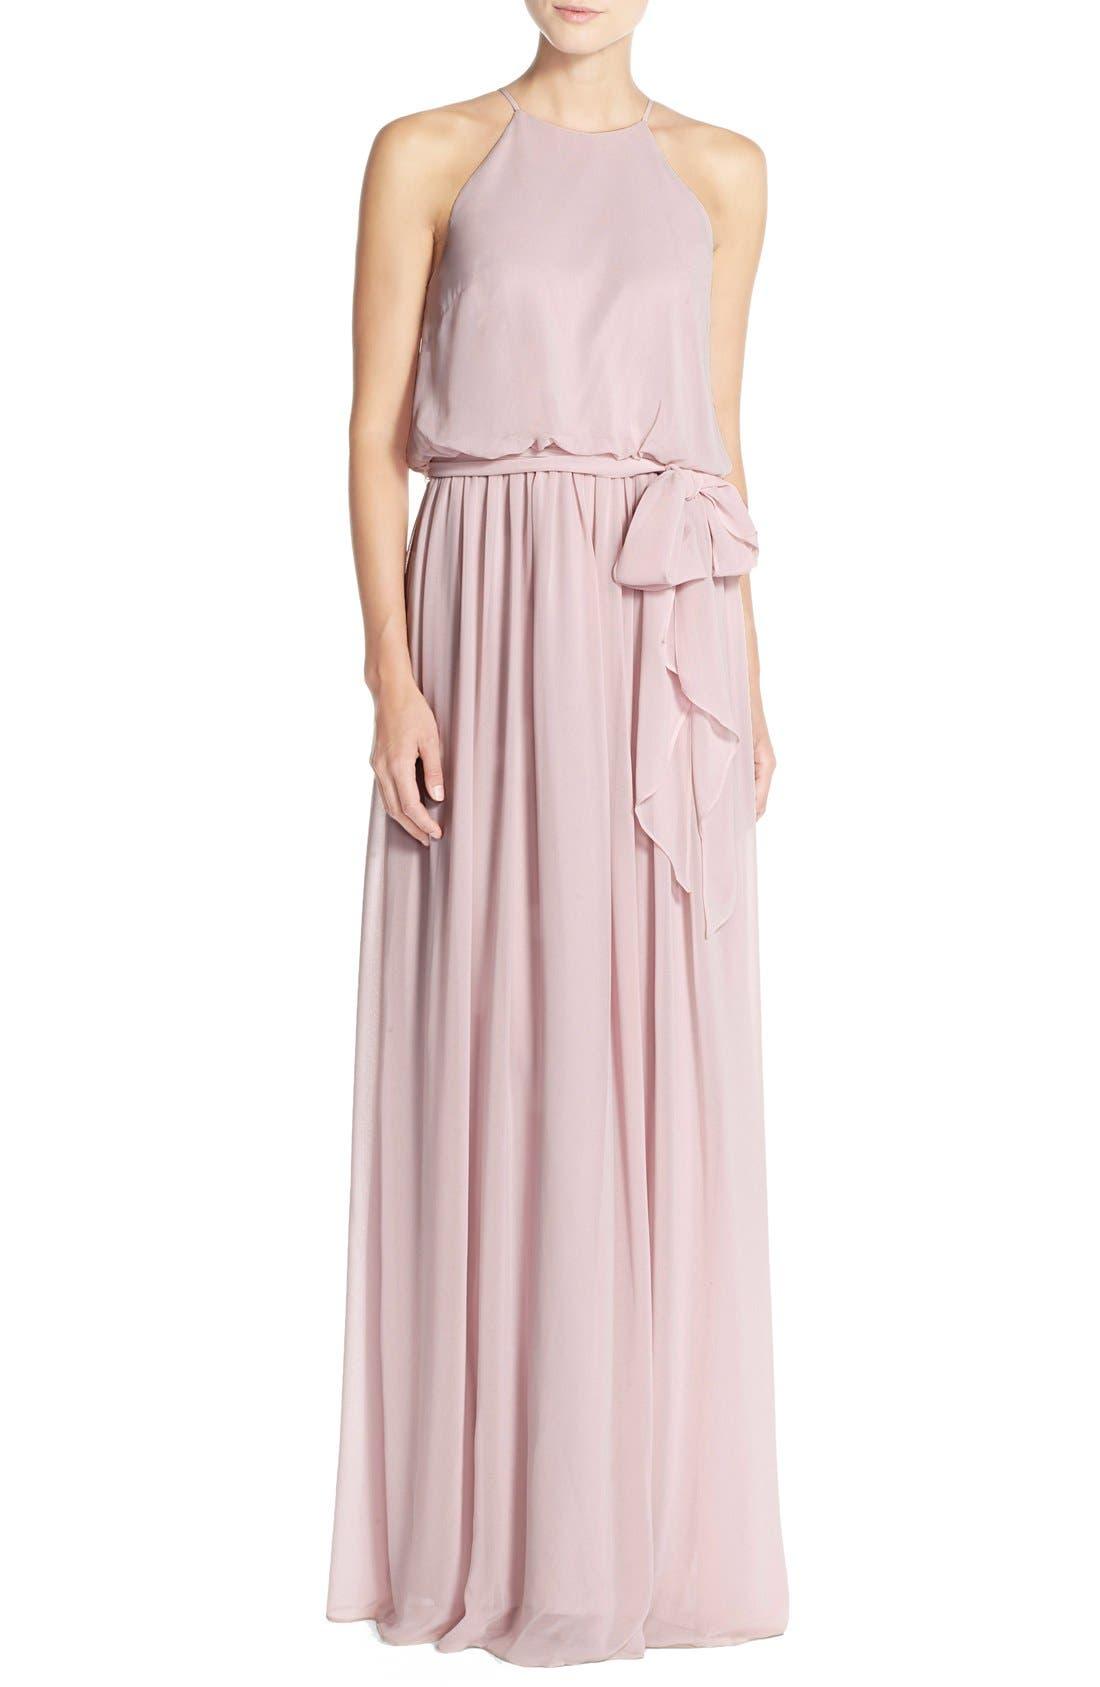 Main Image - Donna Morgan 'Alana' Chiffon Halter Style Gown